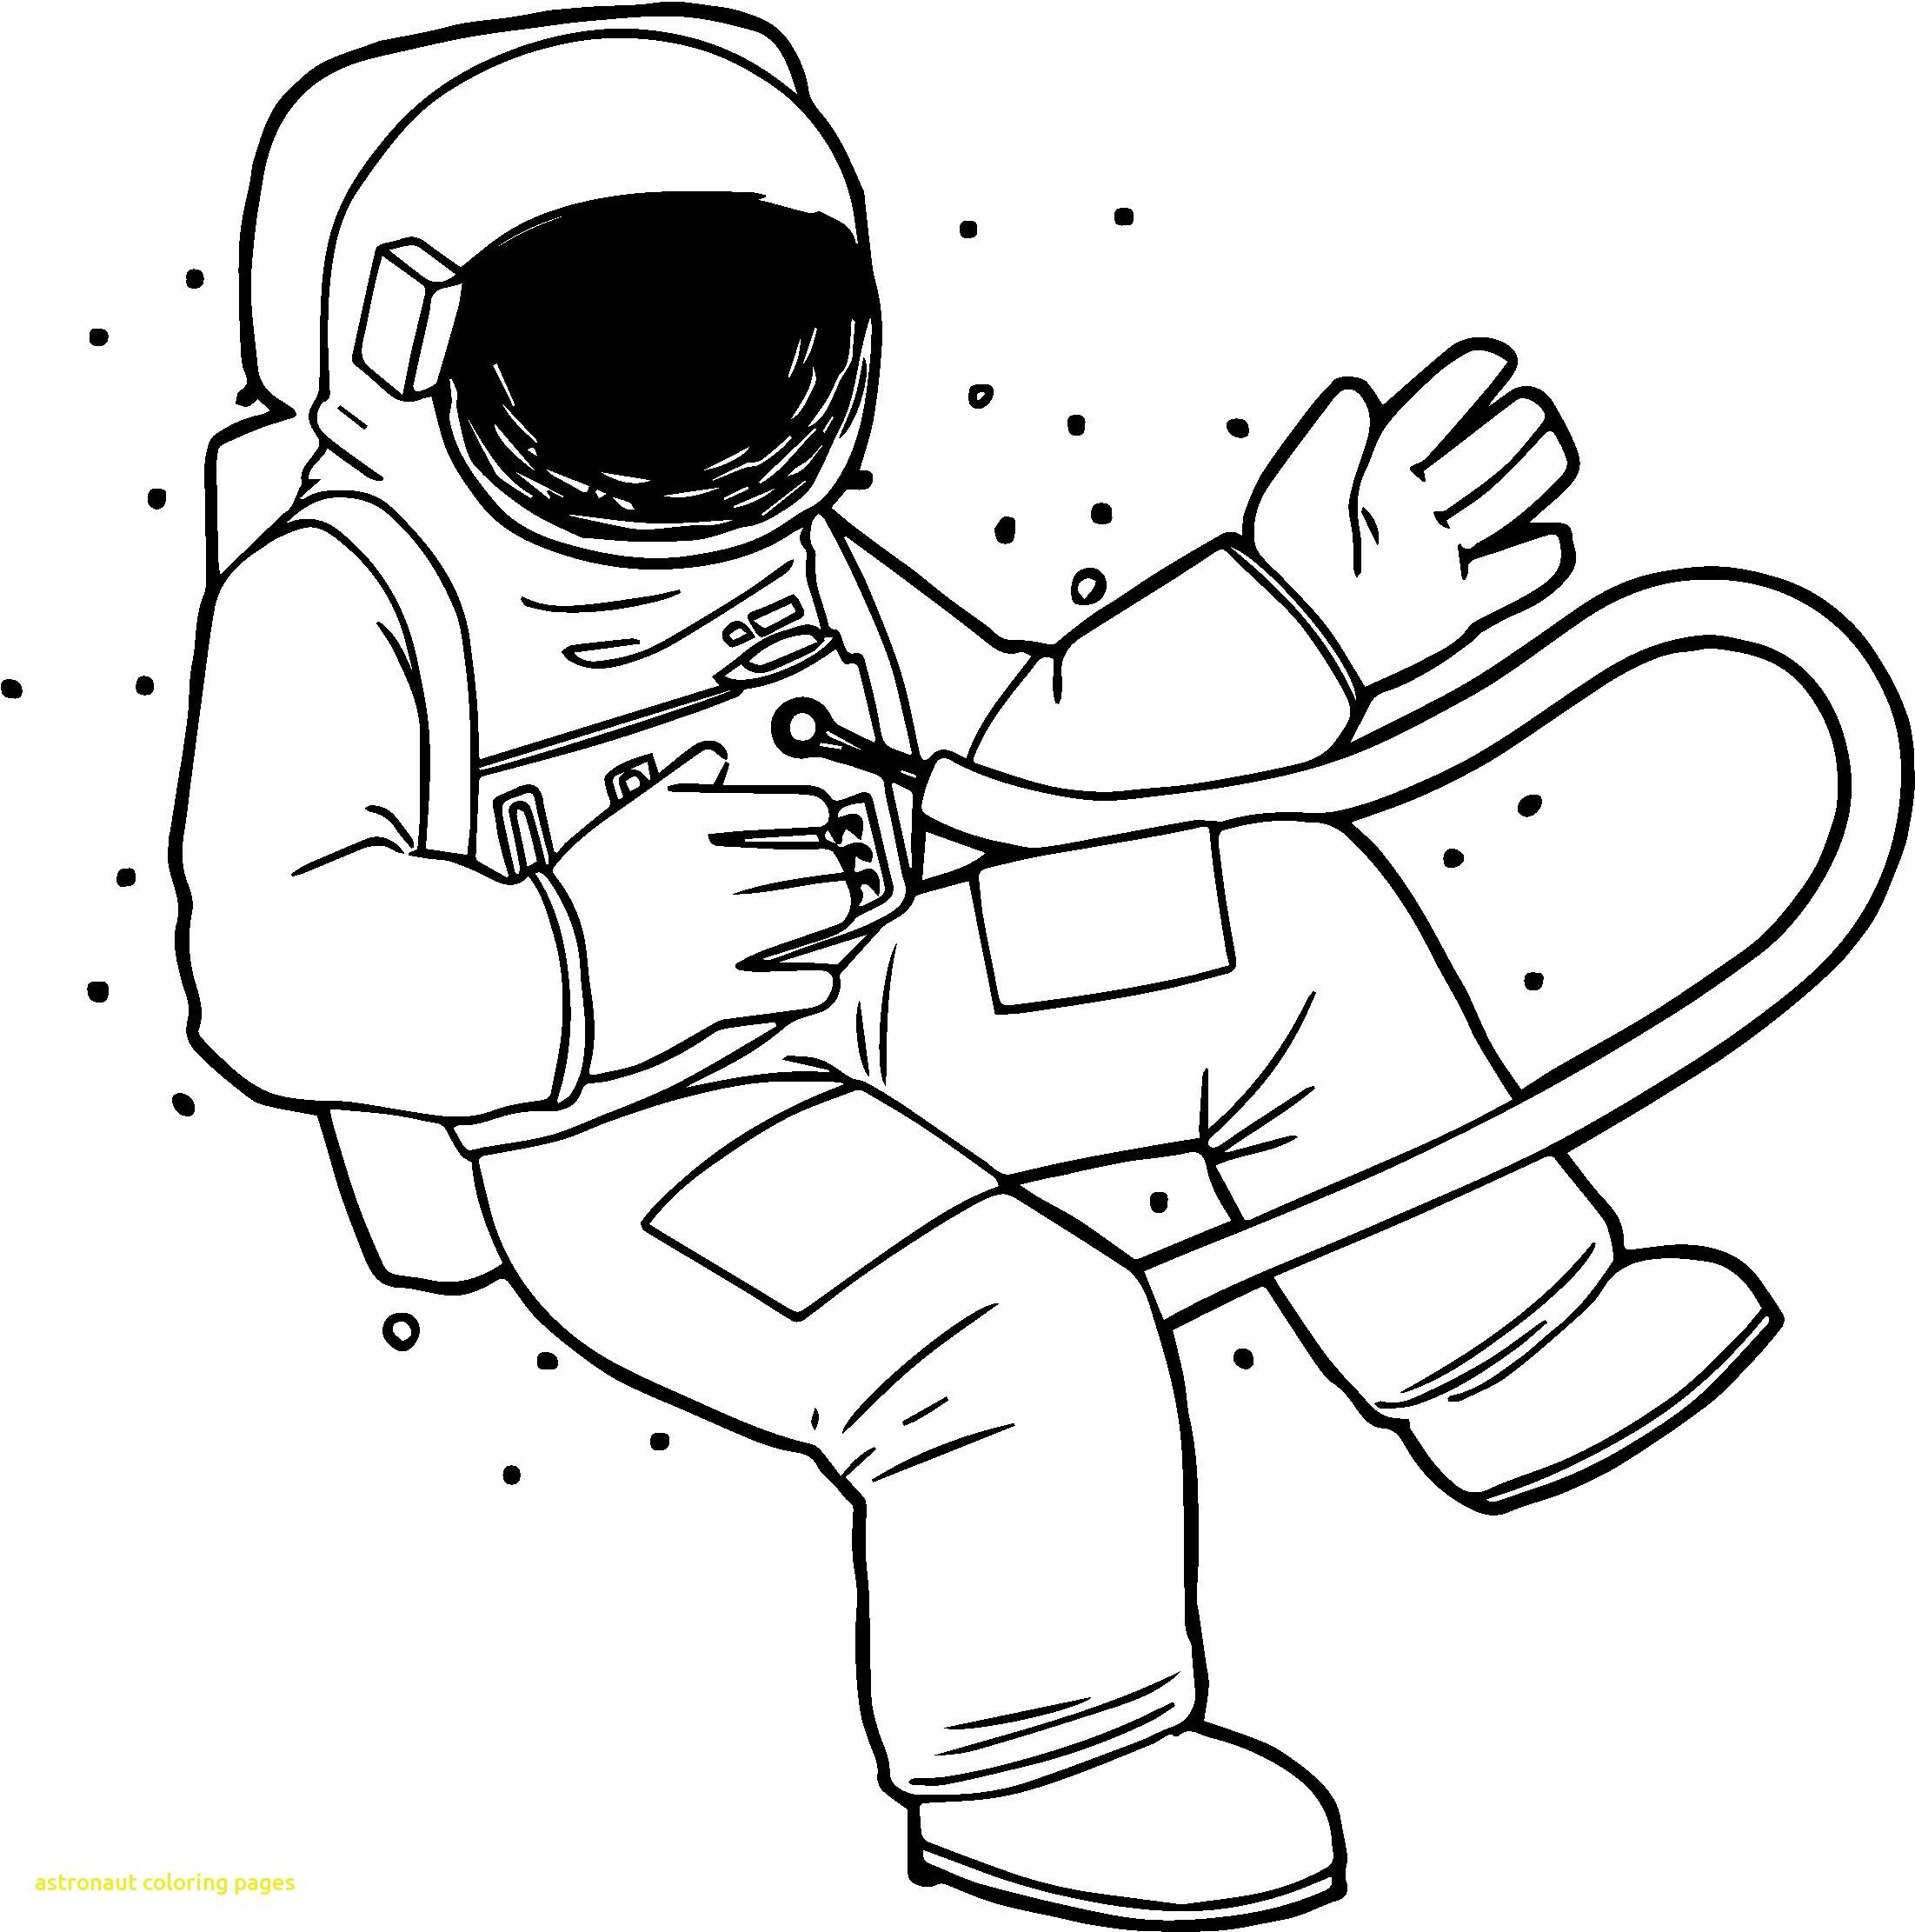 Nasa Spaceship Drawing   Free download on ClipArtMag